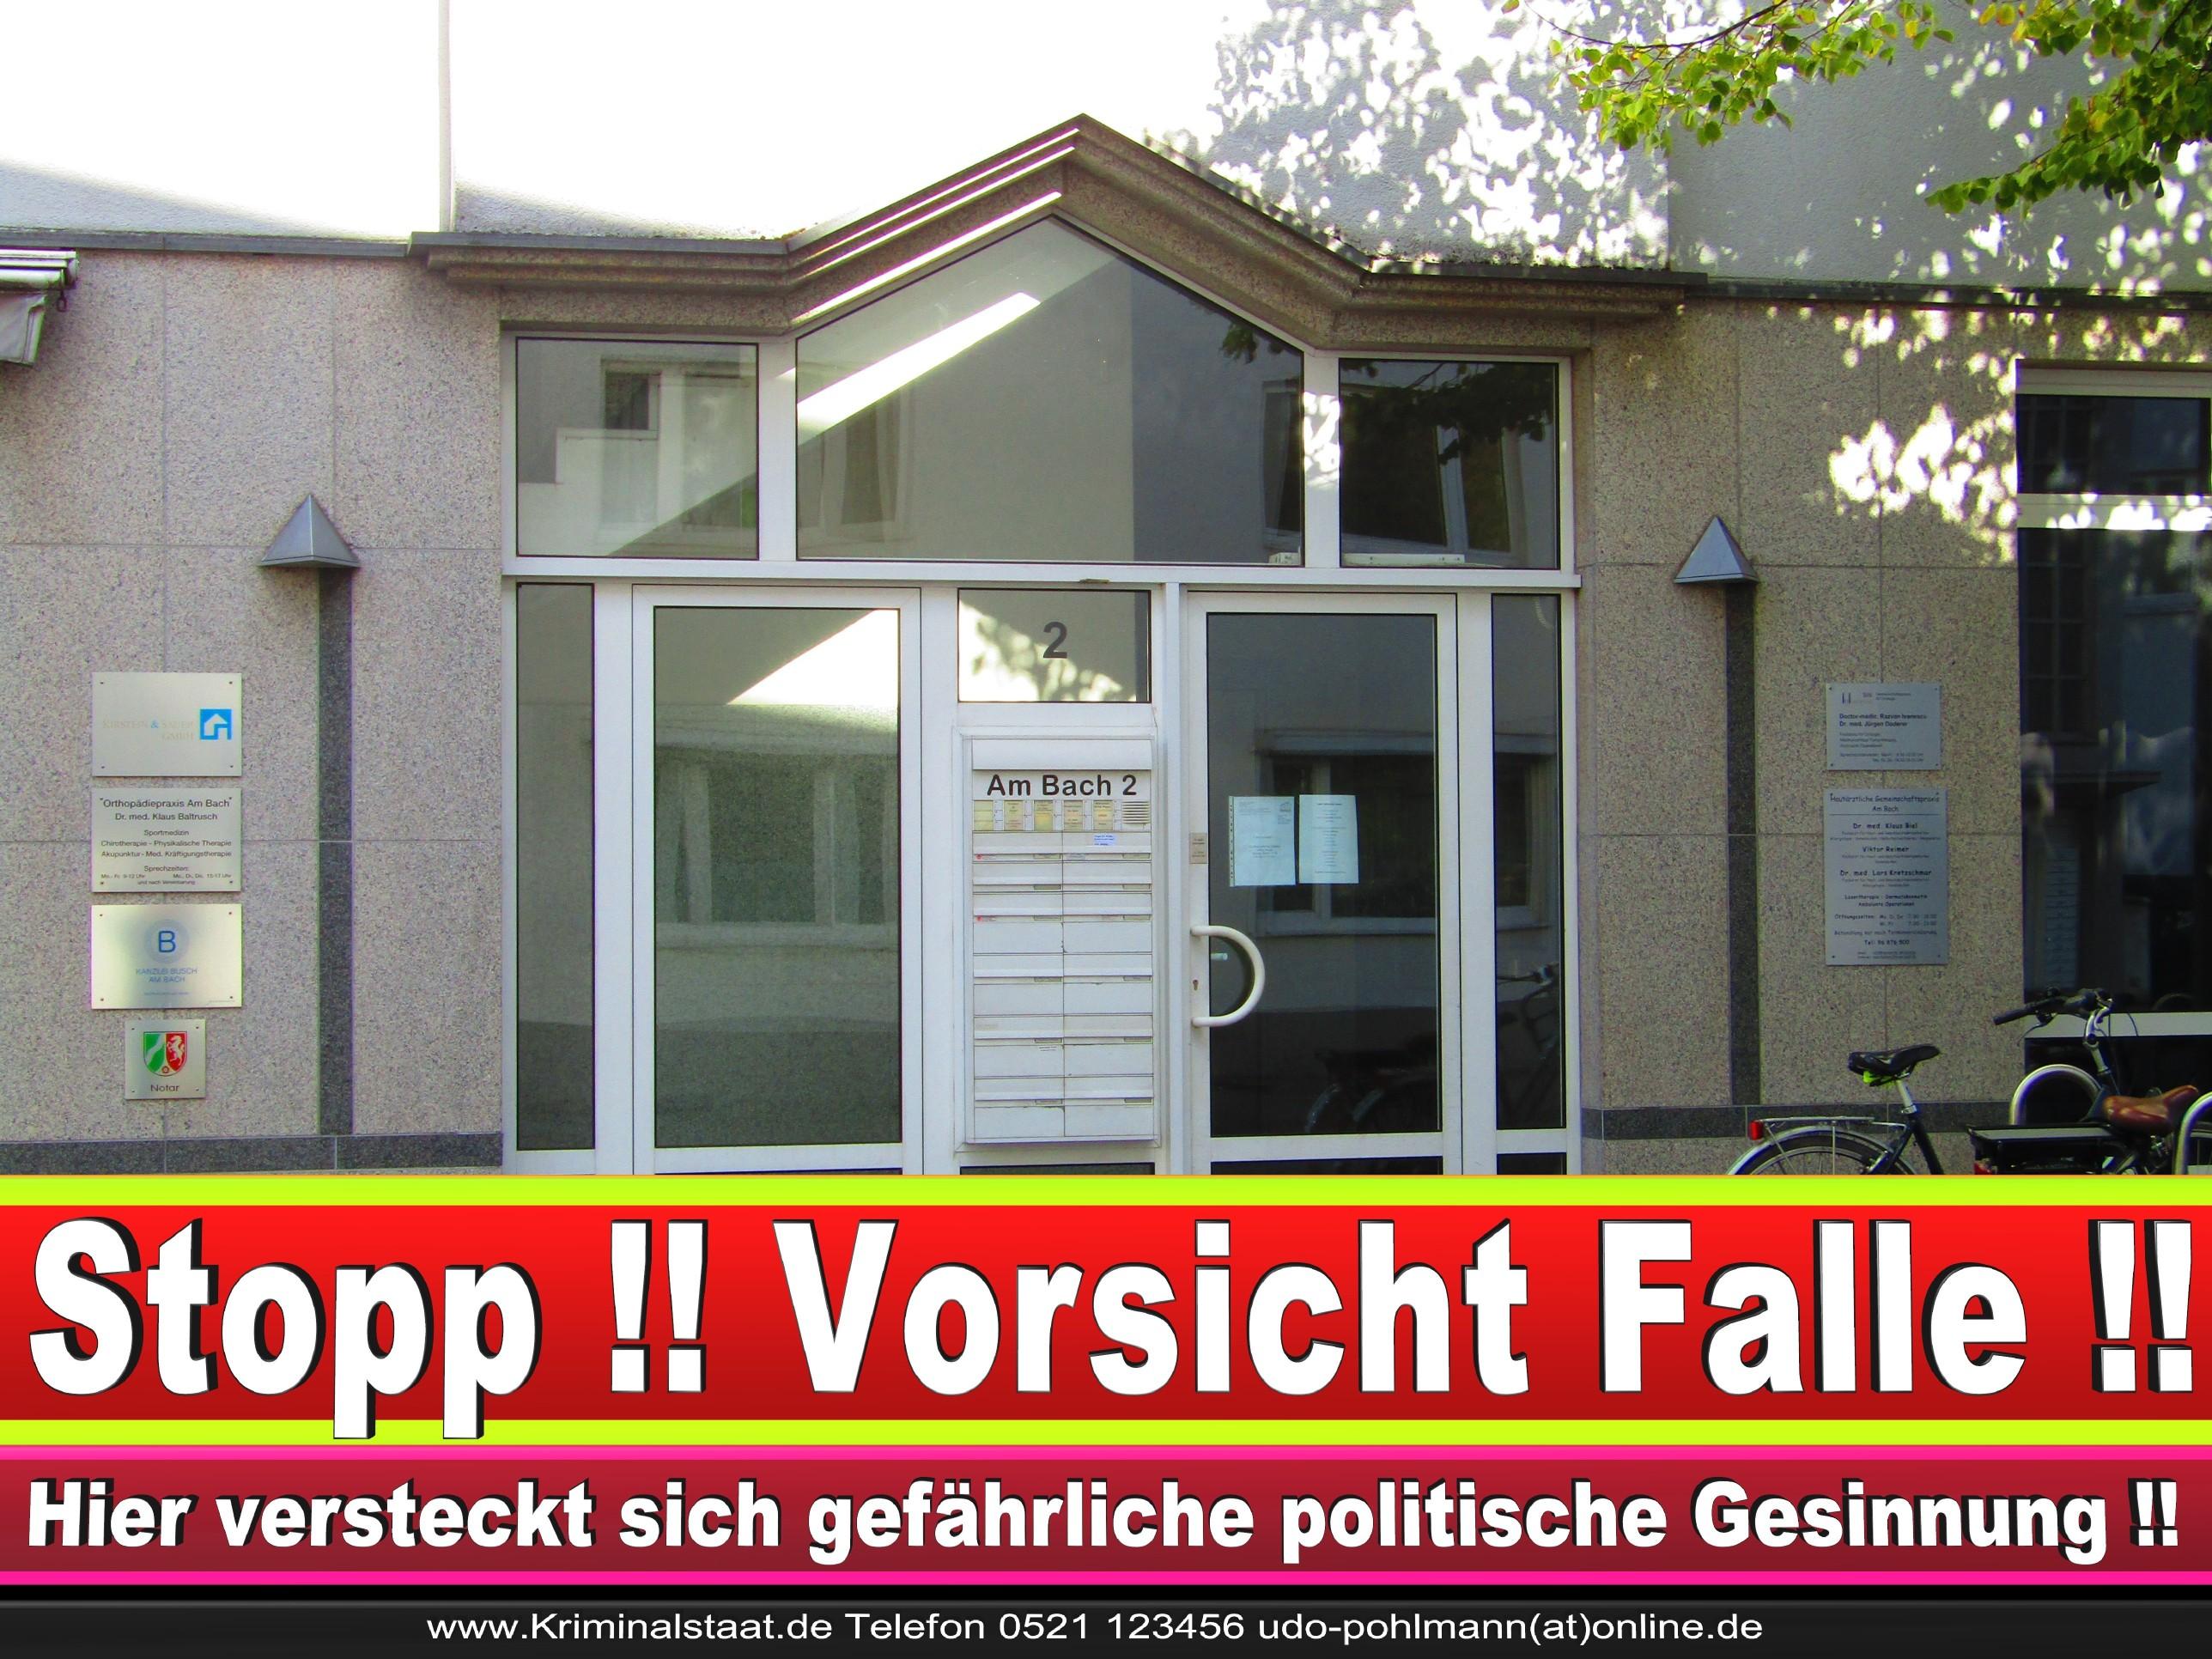 Rechtsanwältin Amelie Busch Am Bach 2 Bielefeld CDU 2